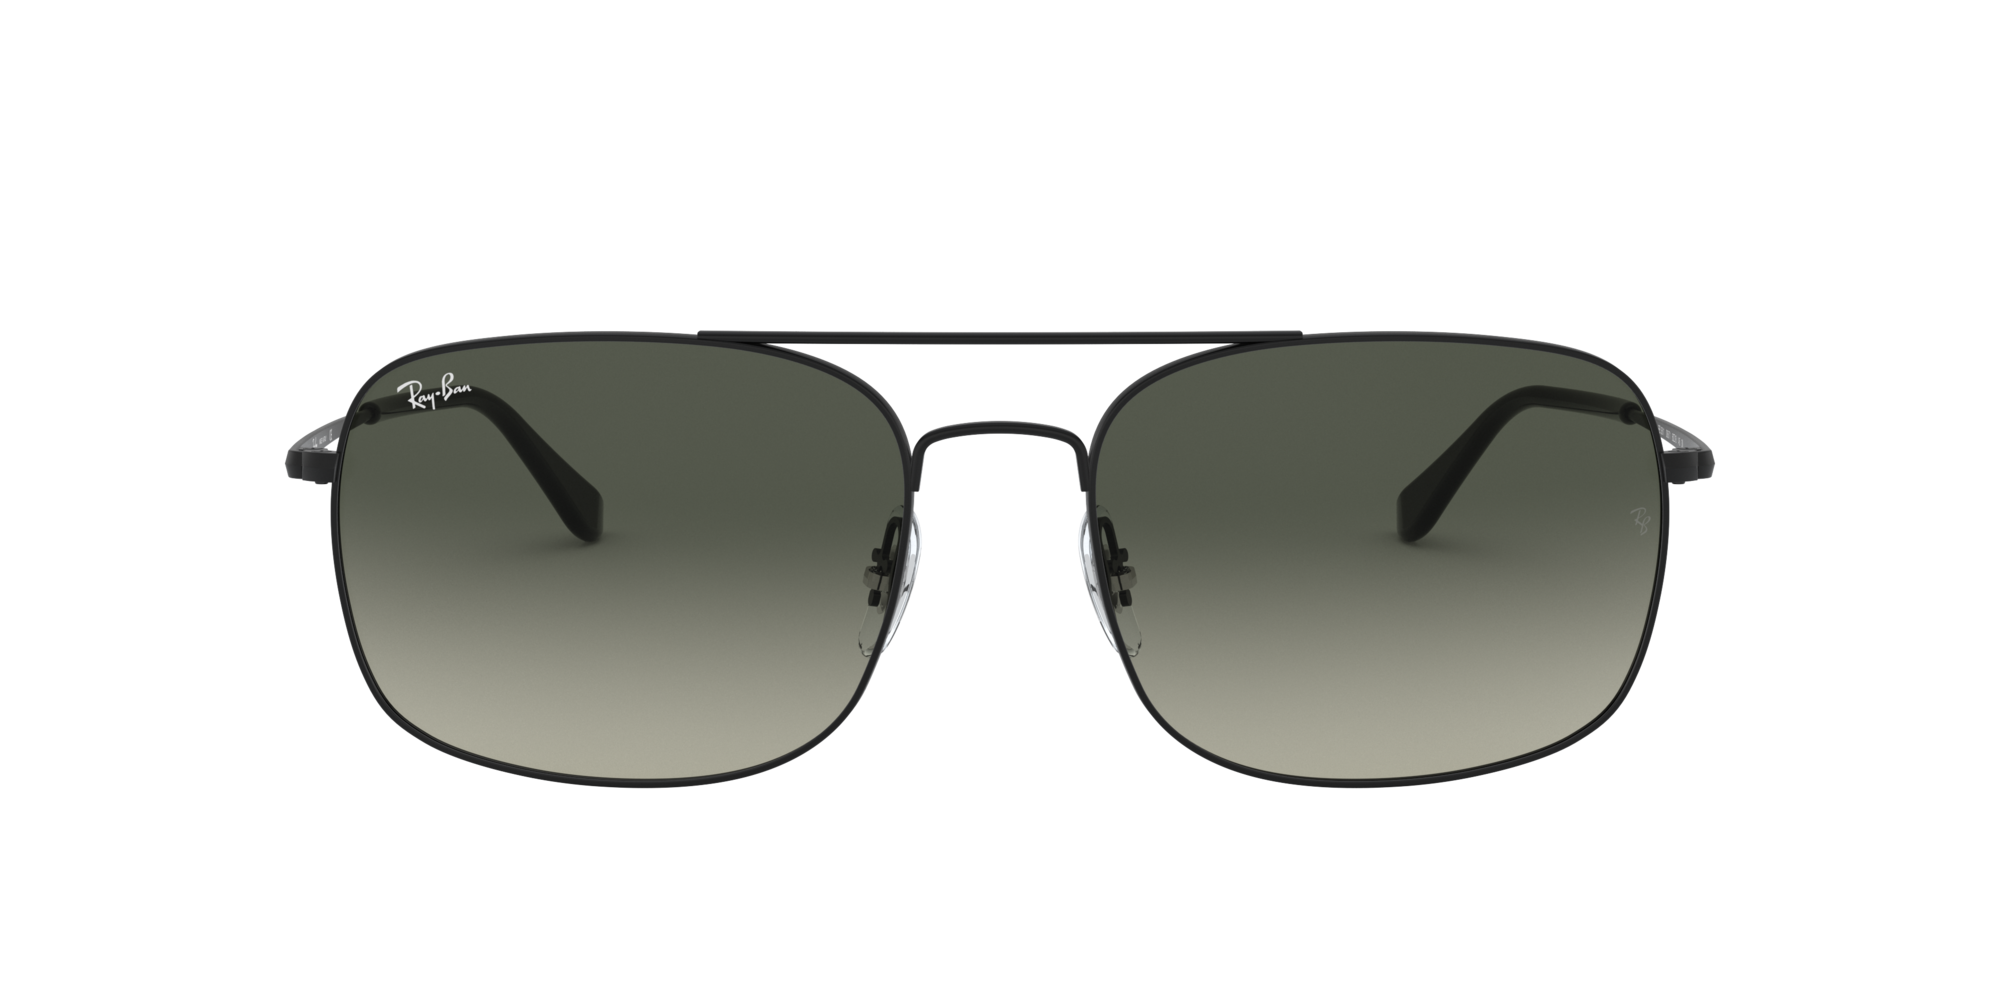 Image for RB3611 60 from LensCrafters | Glasses, Prescription Glasses Online, Eyewear